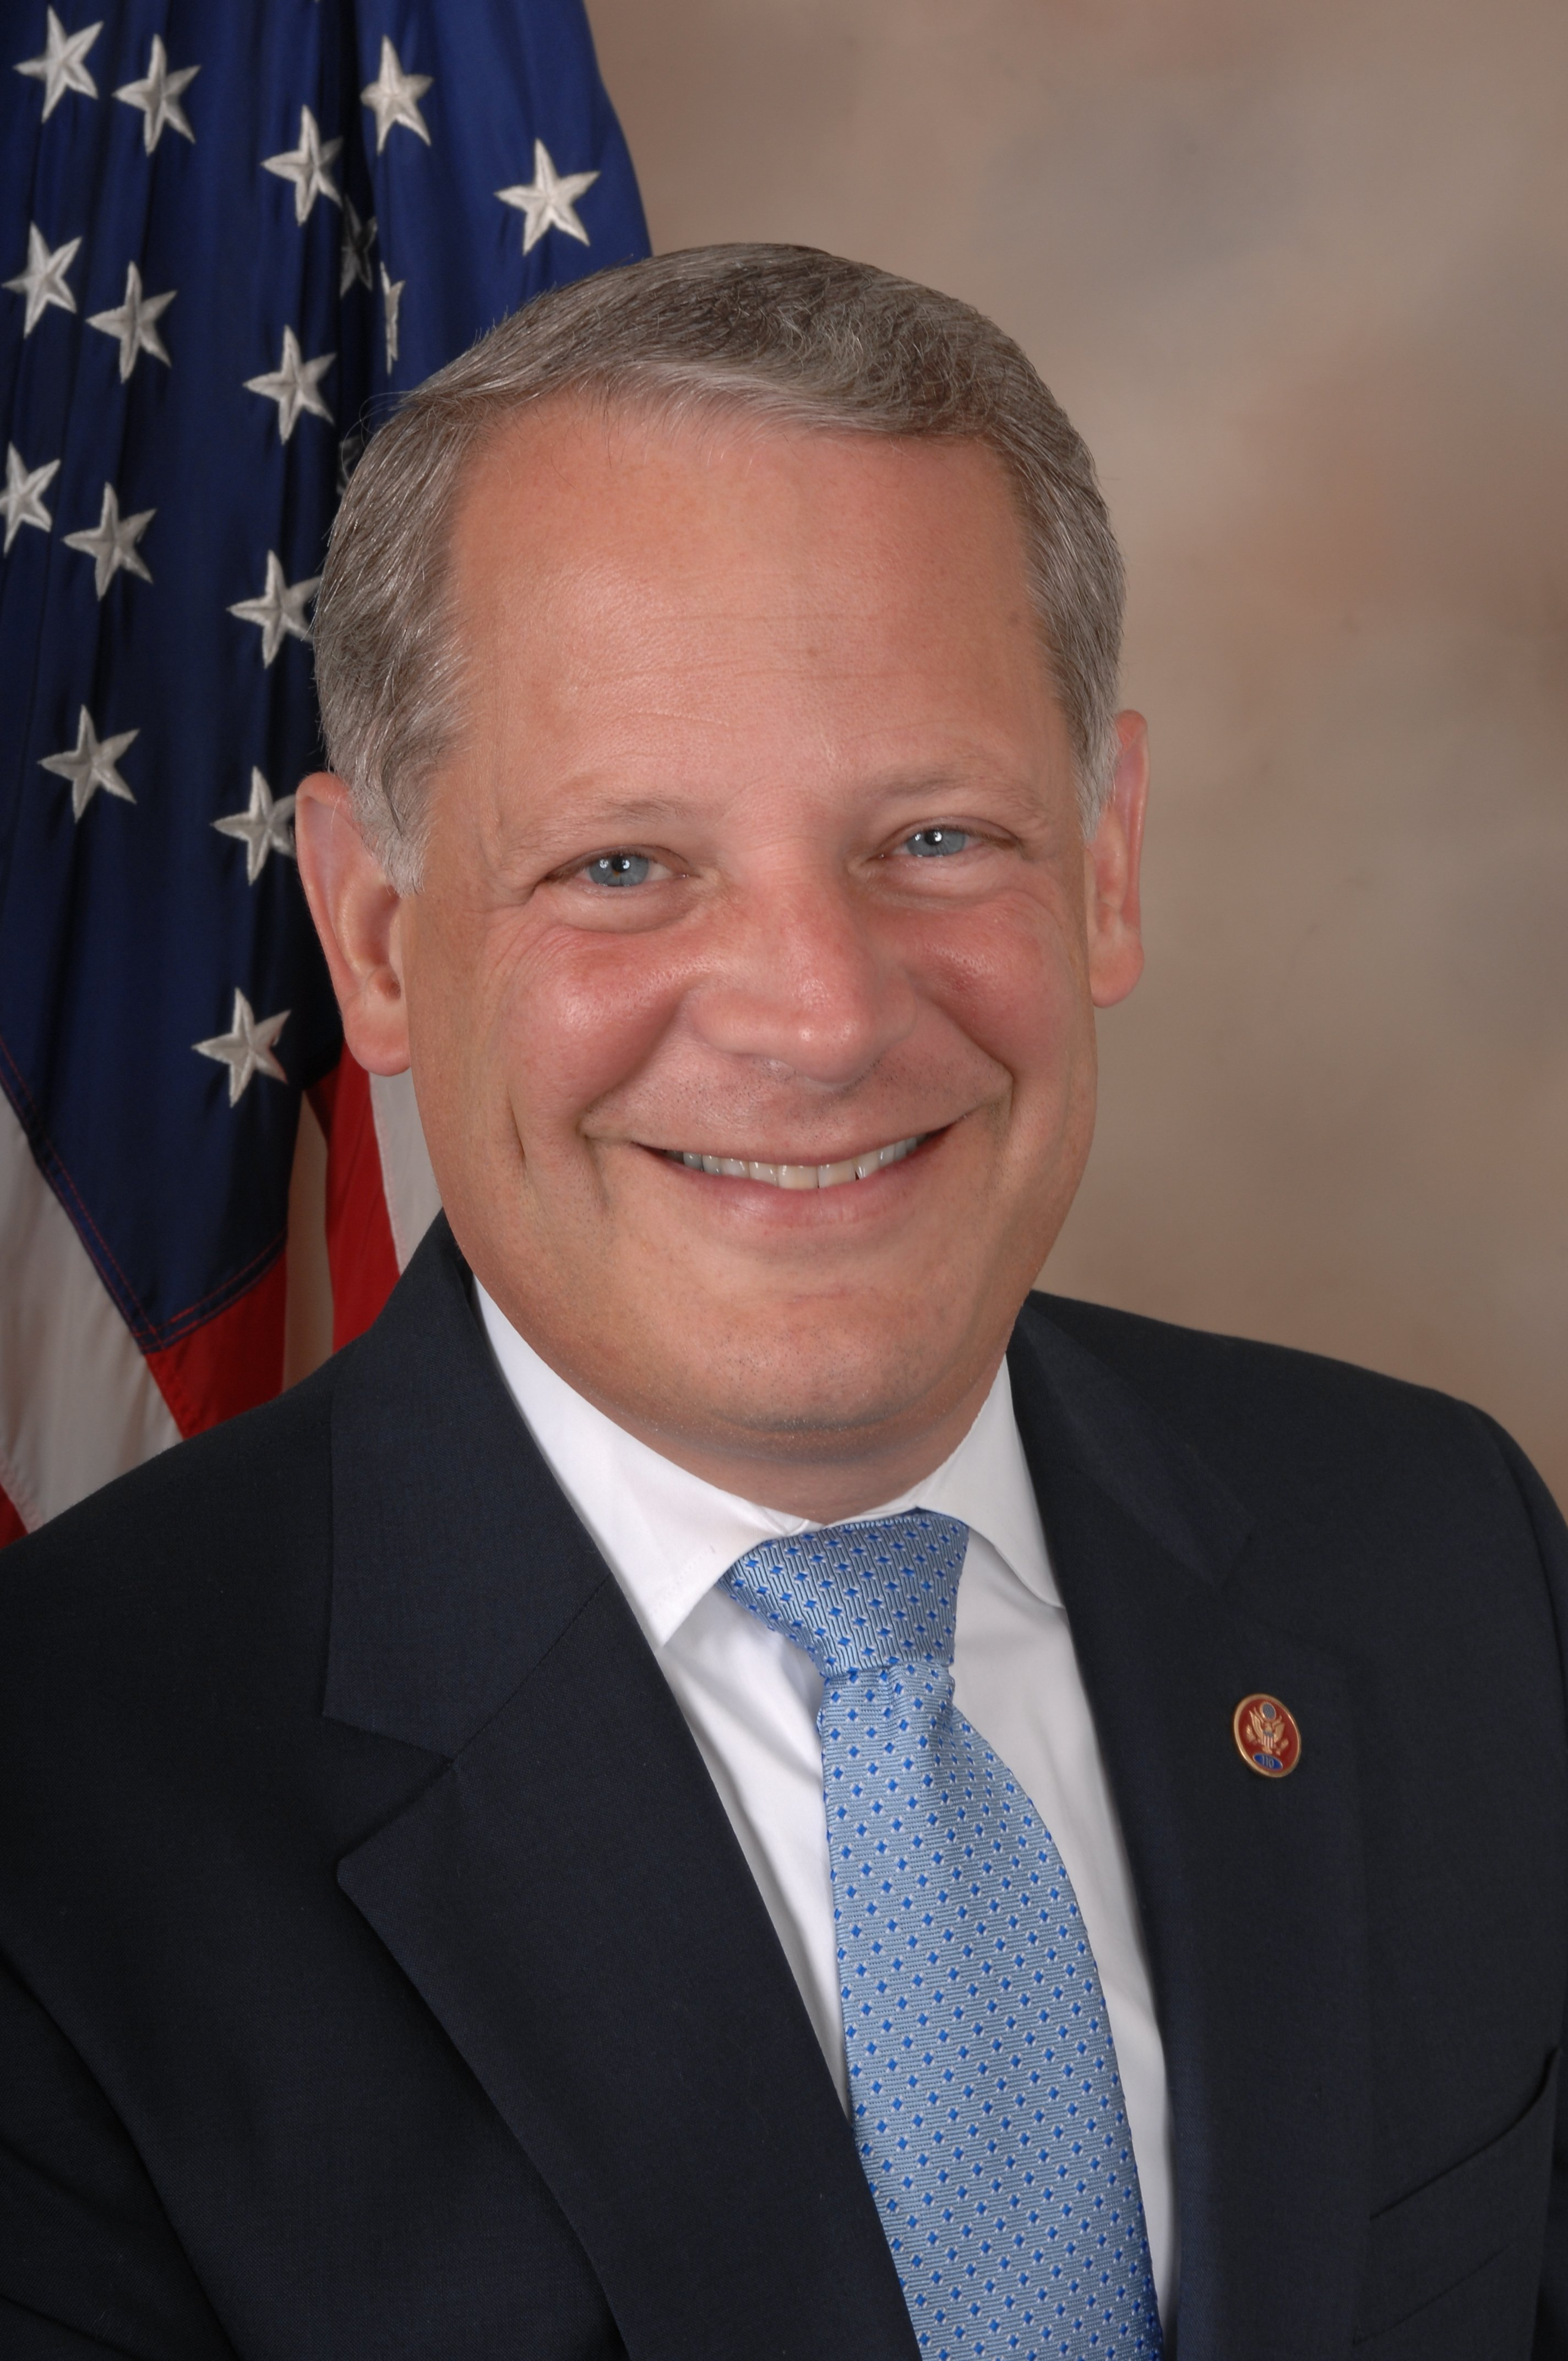 Steve Israel's legislation would help student loan LRAP beneficiaries